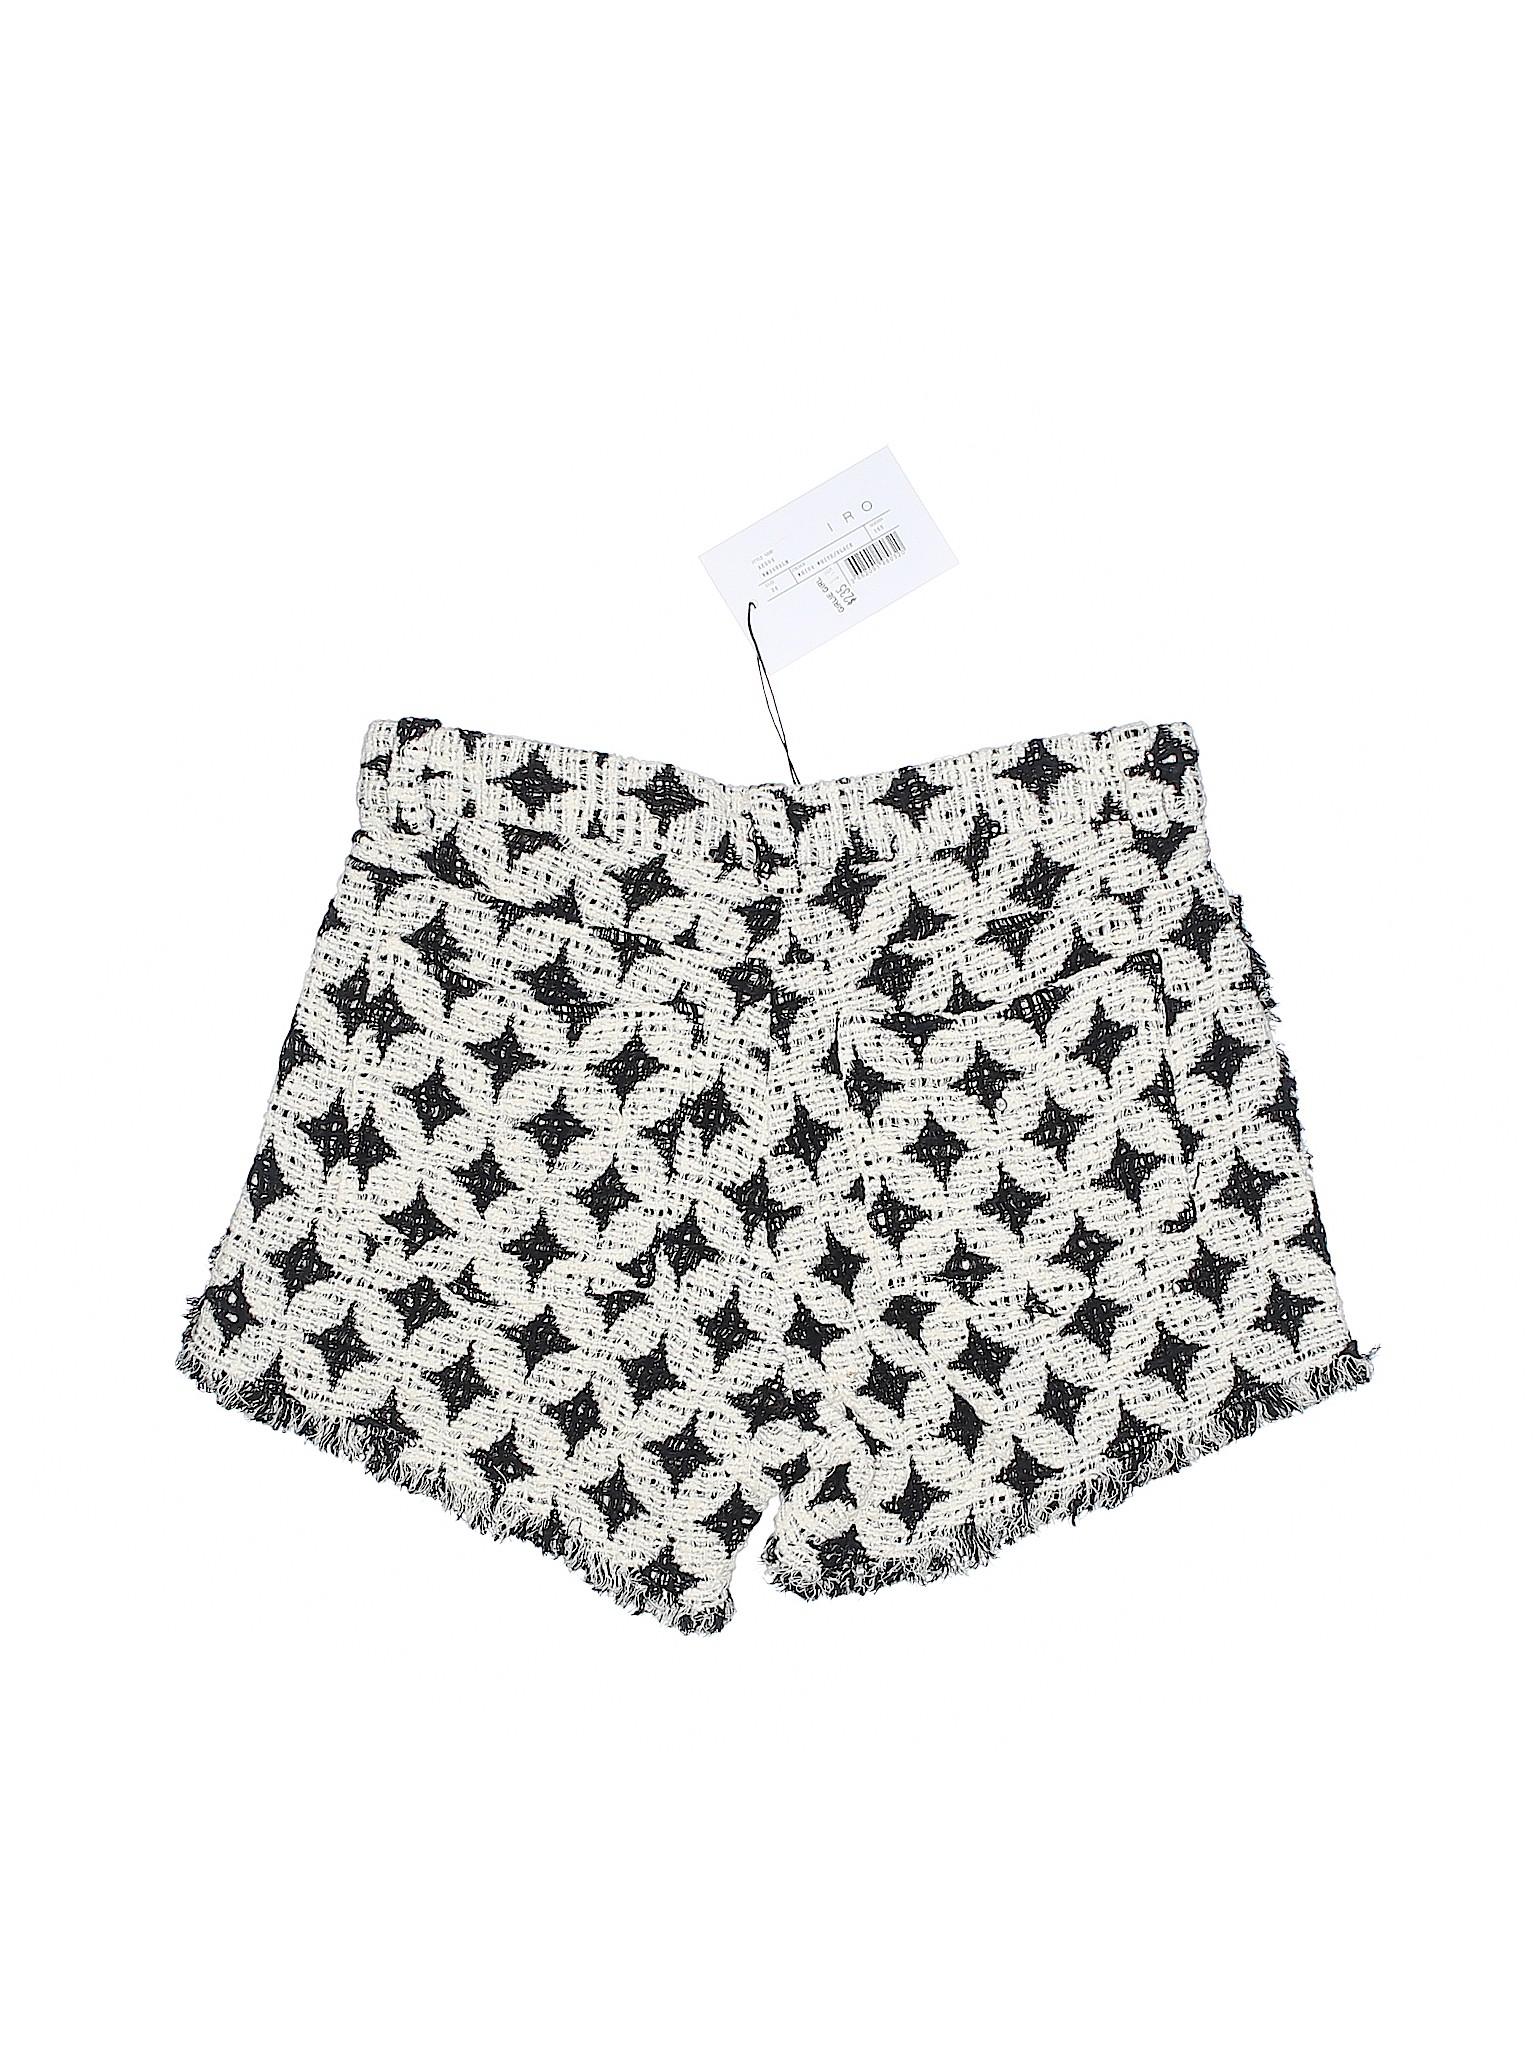 Shorts IRO Boutique Boutique leisure leisure IRO BqpxfwX